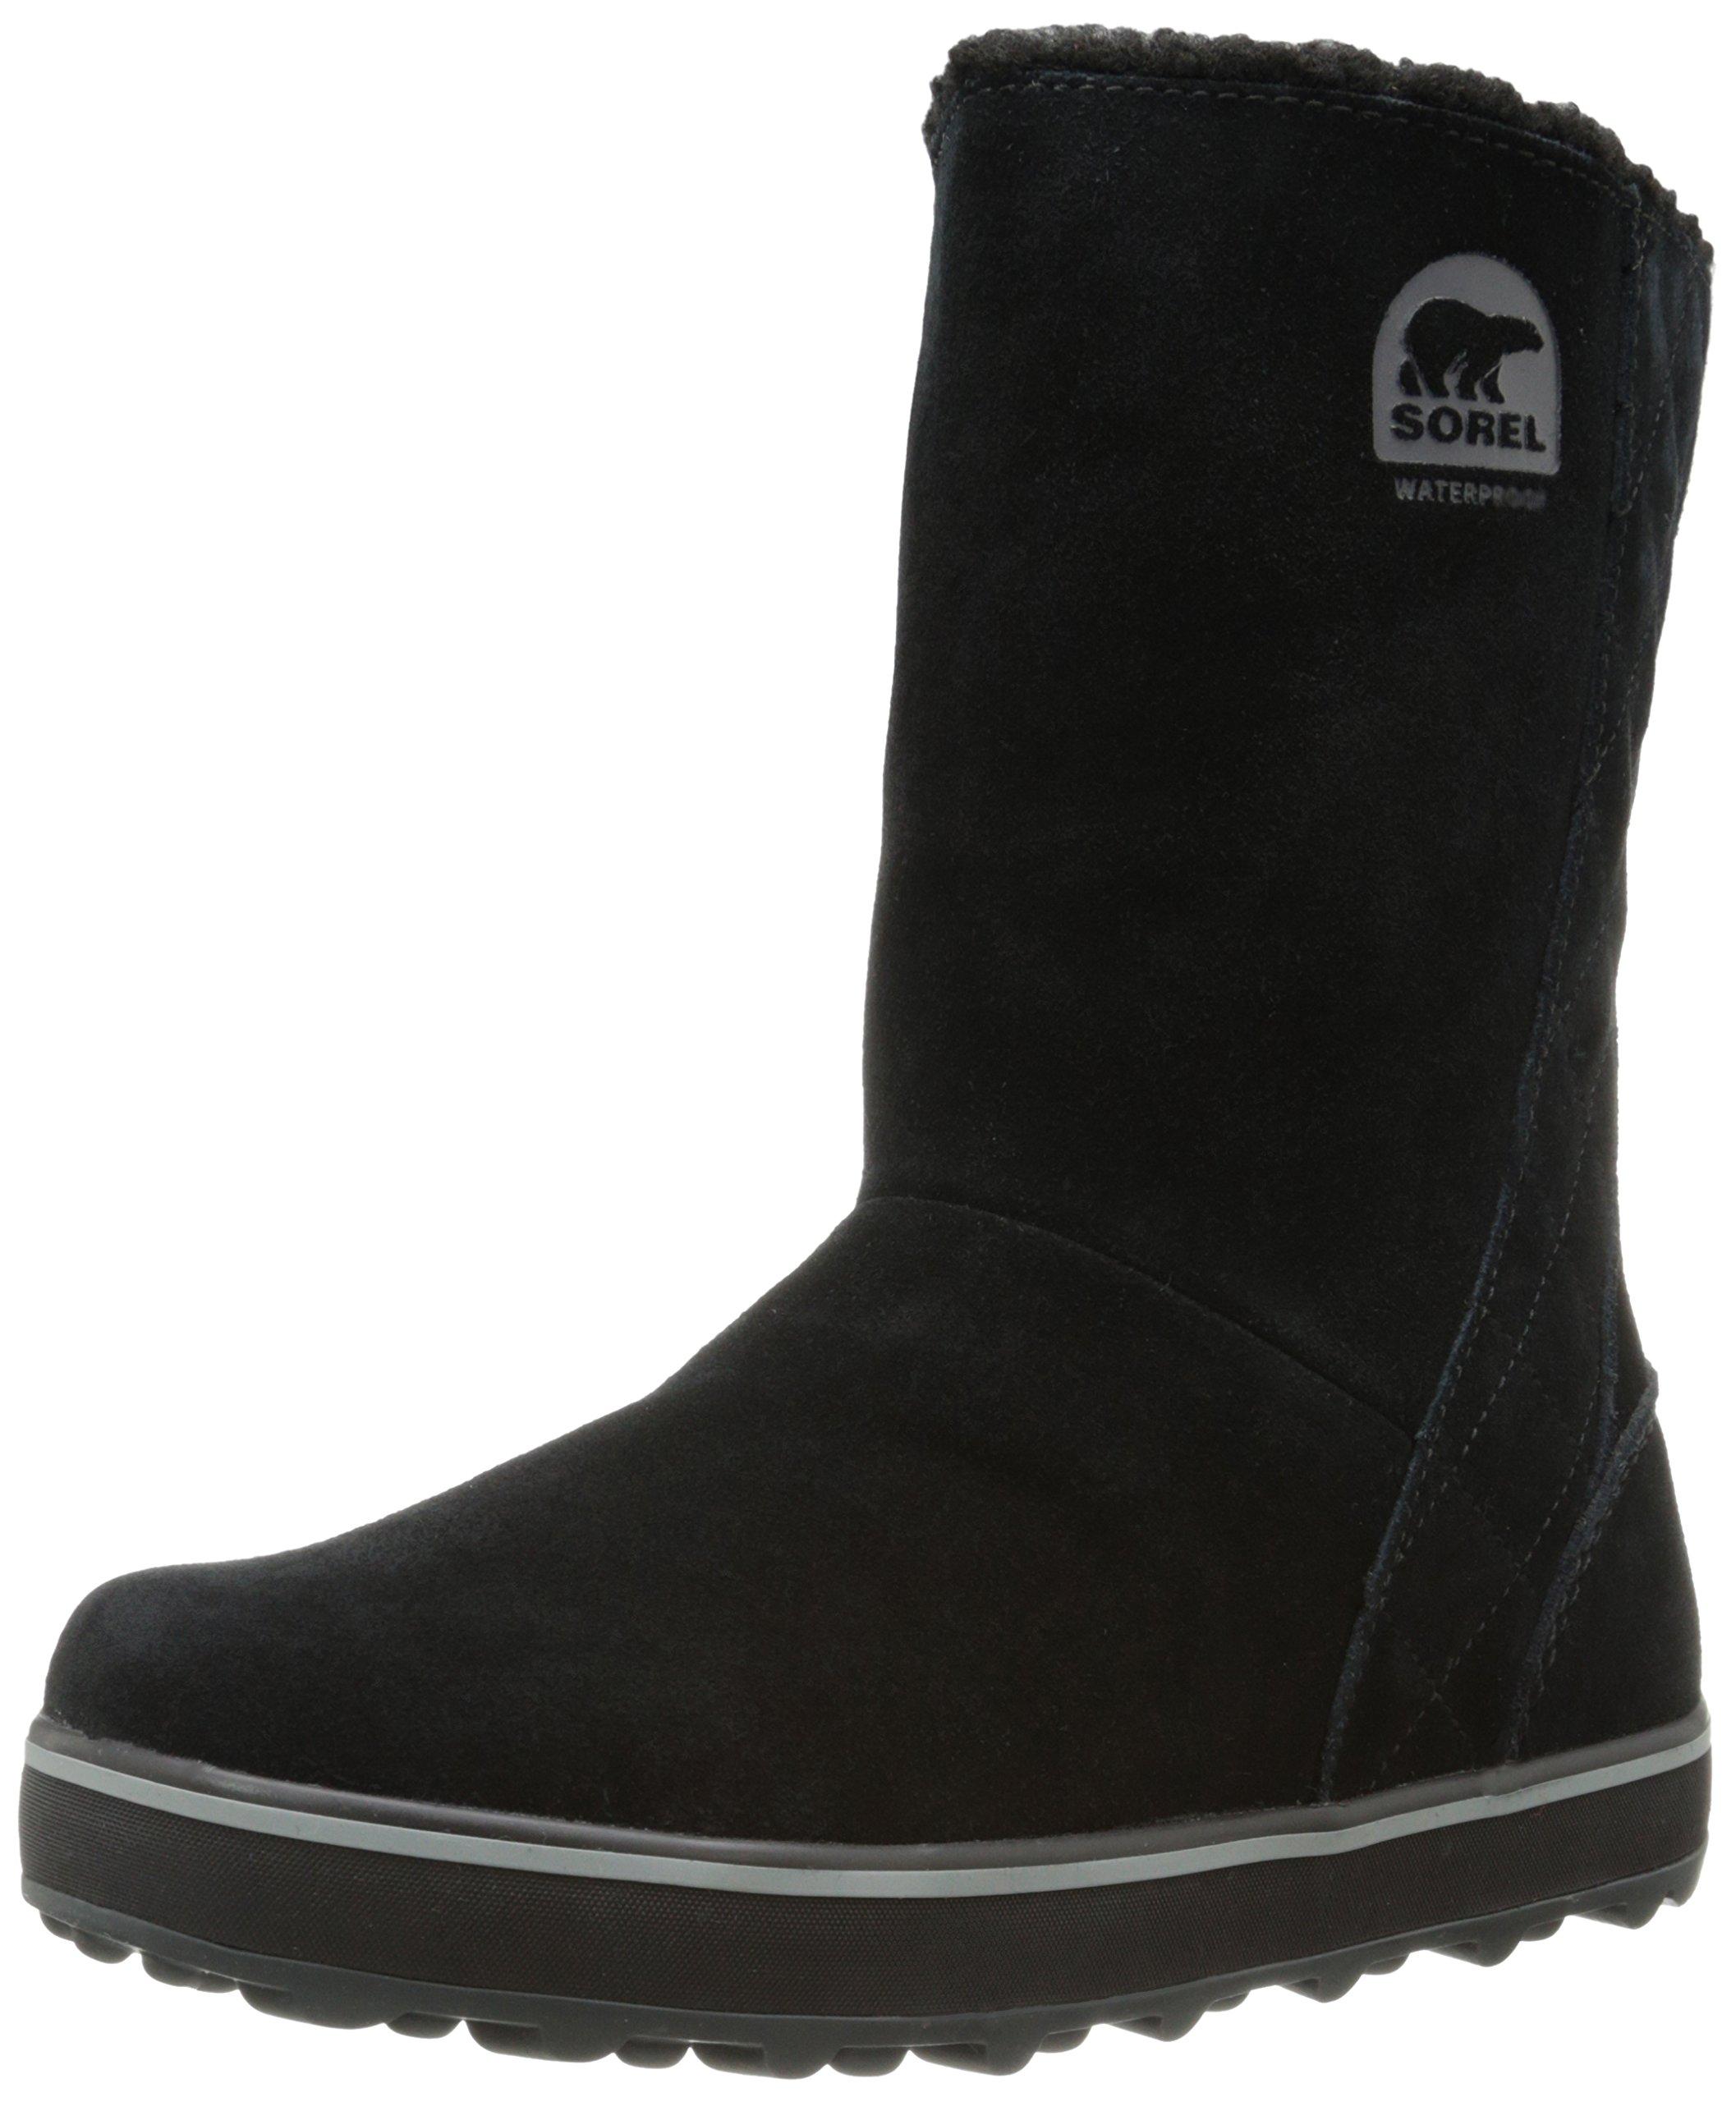 Sorel Women's Glacy Snow Boot,Black,11 M US